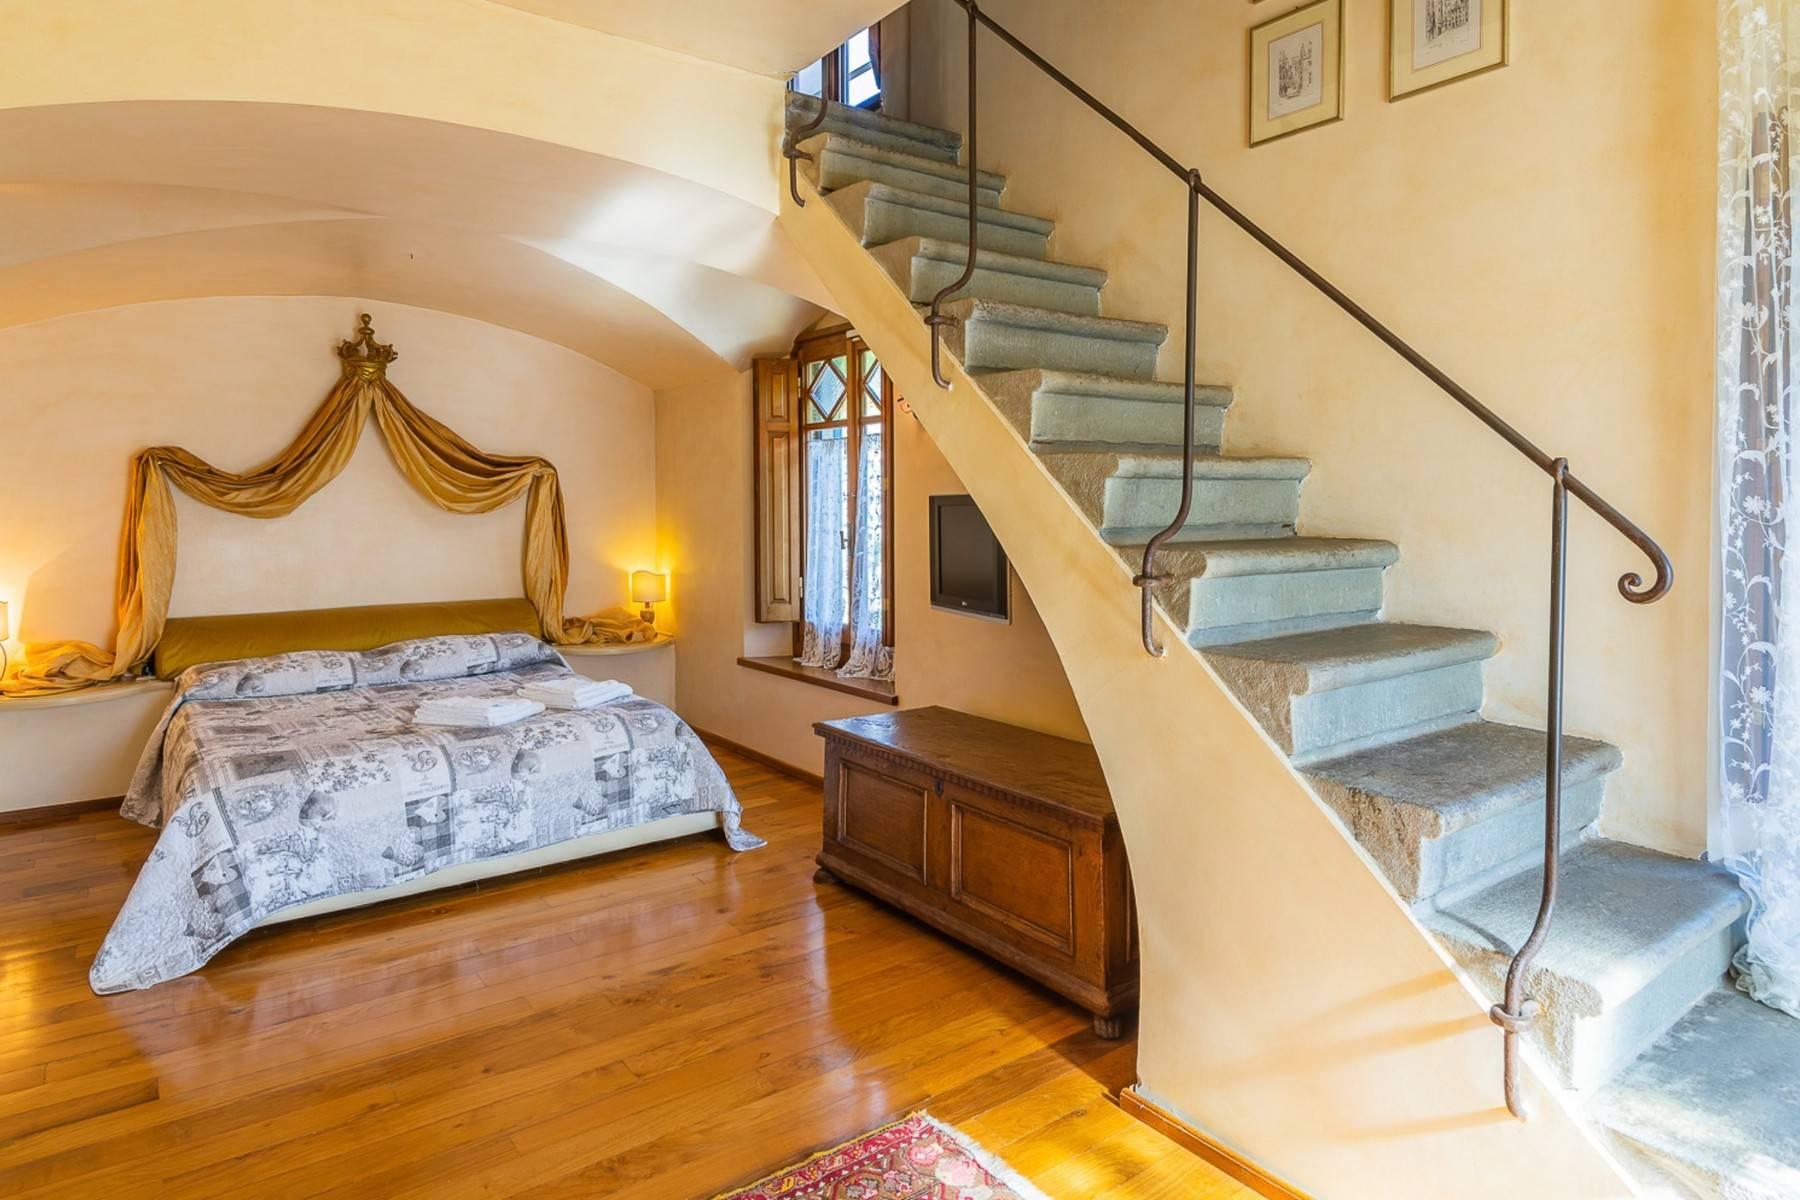 Villa in Vendita a Lucca: 5 locali, 1130 mq - Foto 11